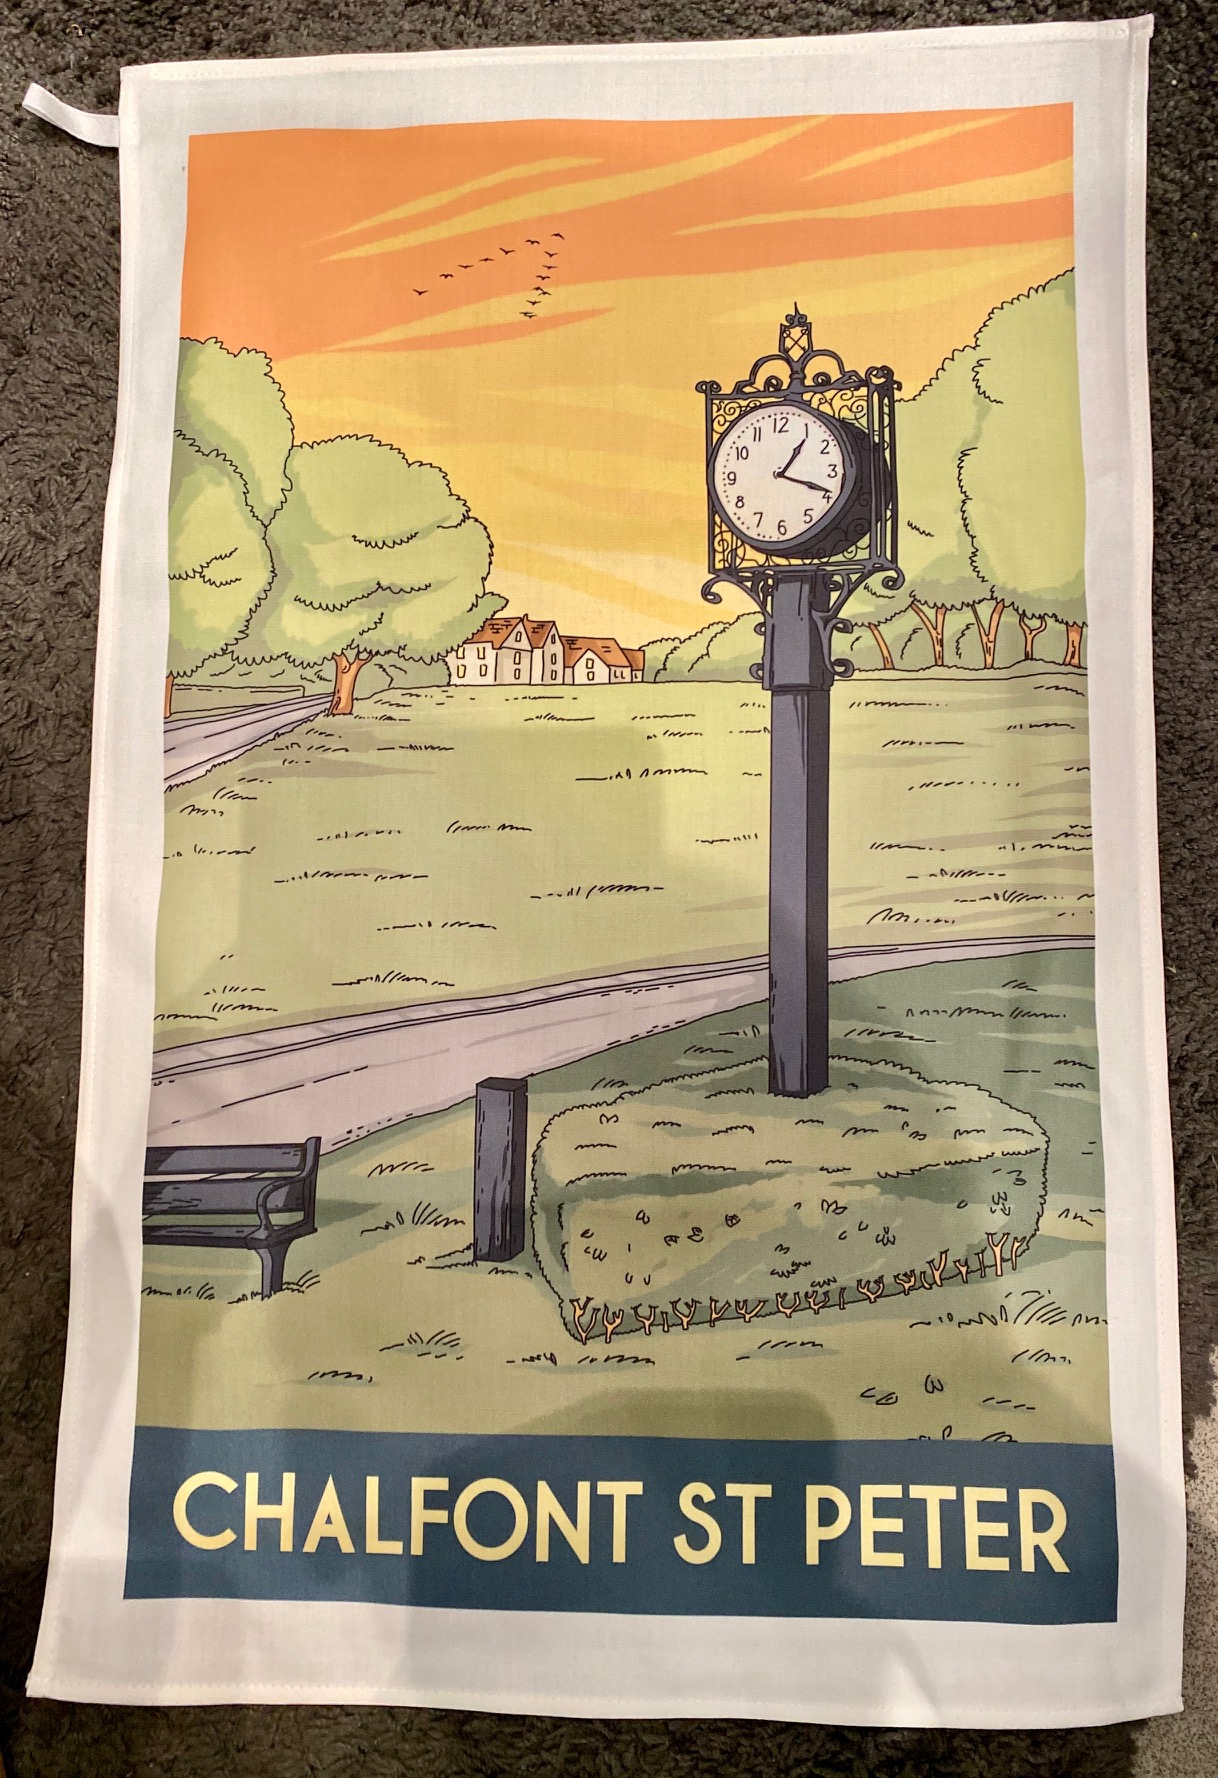 Chalfont St Peter vintage art tea towel